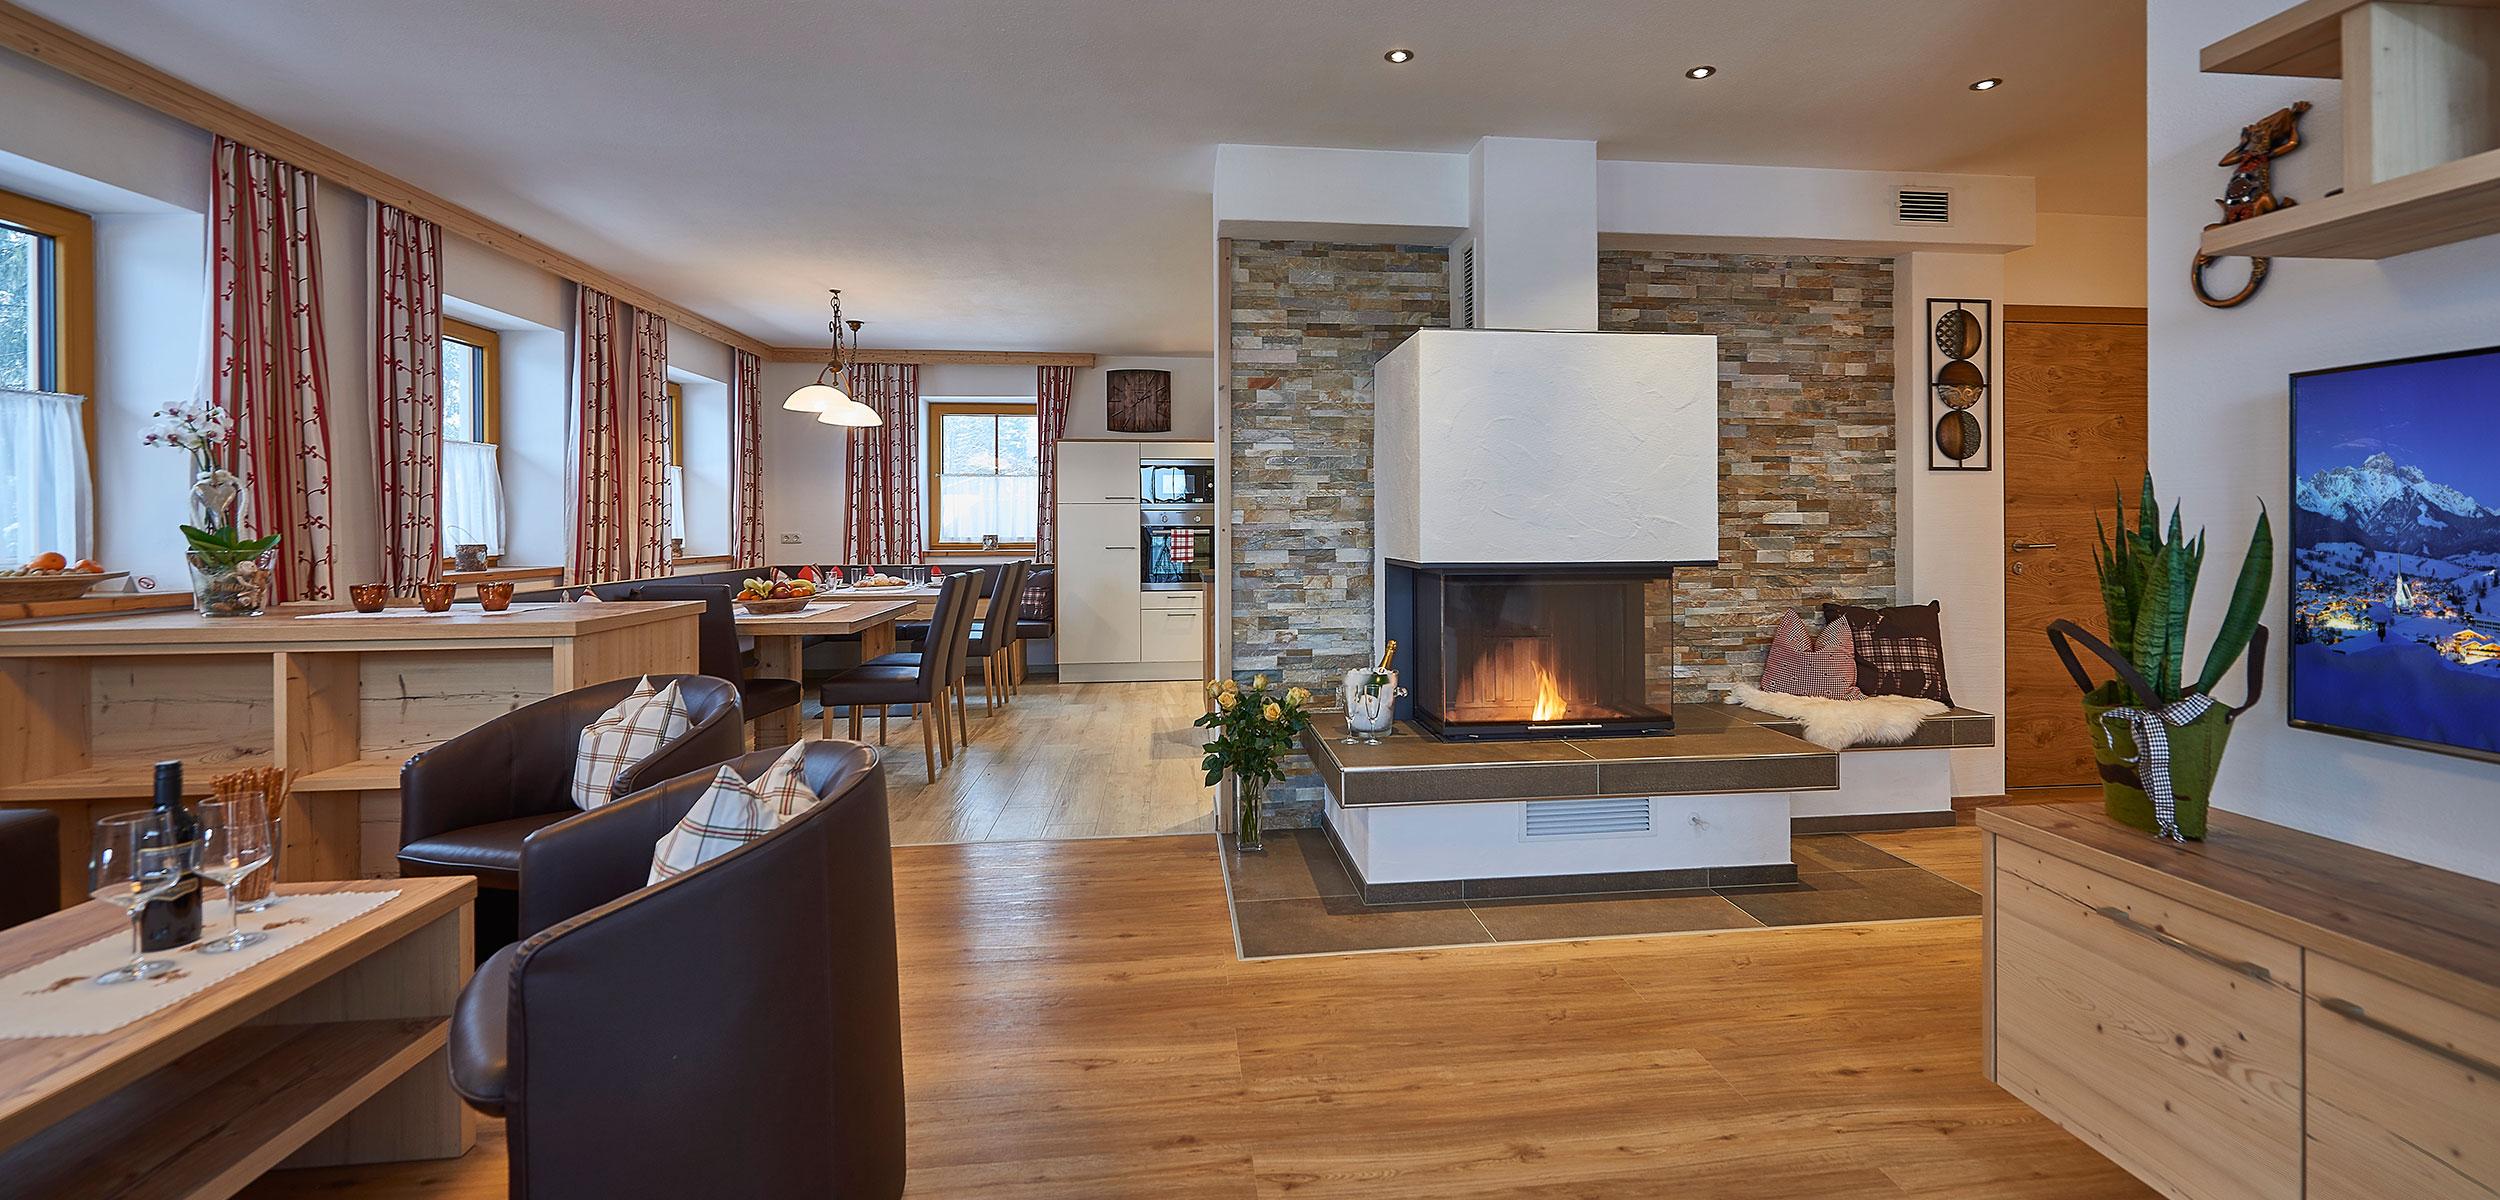 pension und appartements anny unser chalet. Black Bedroom Furniture Sets. Home Design Ideas